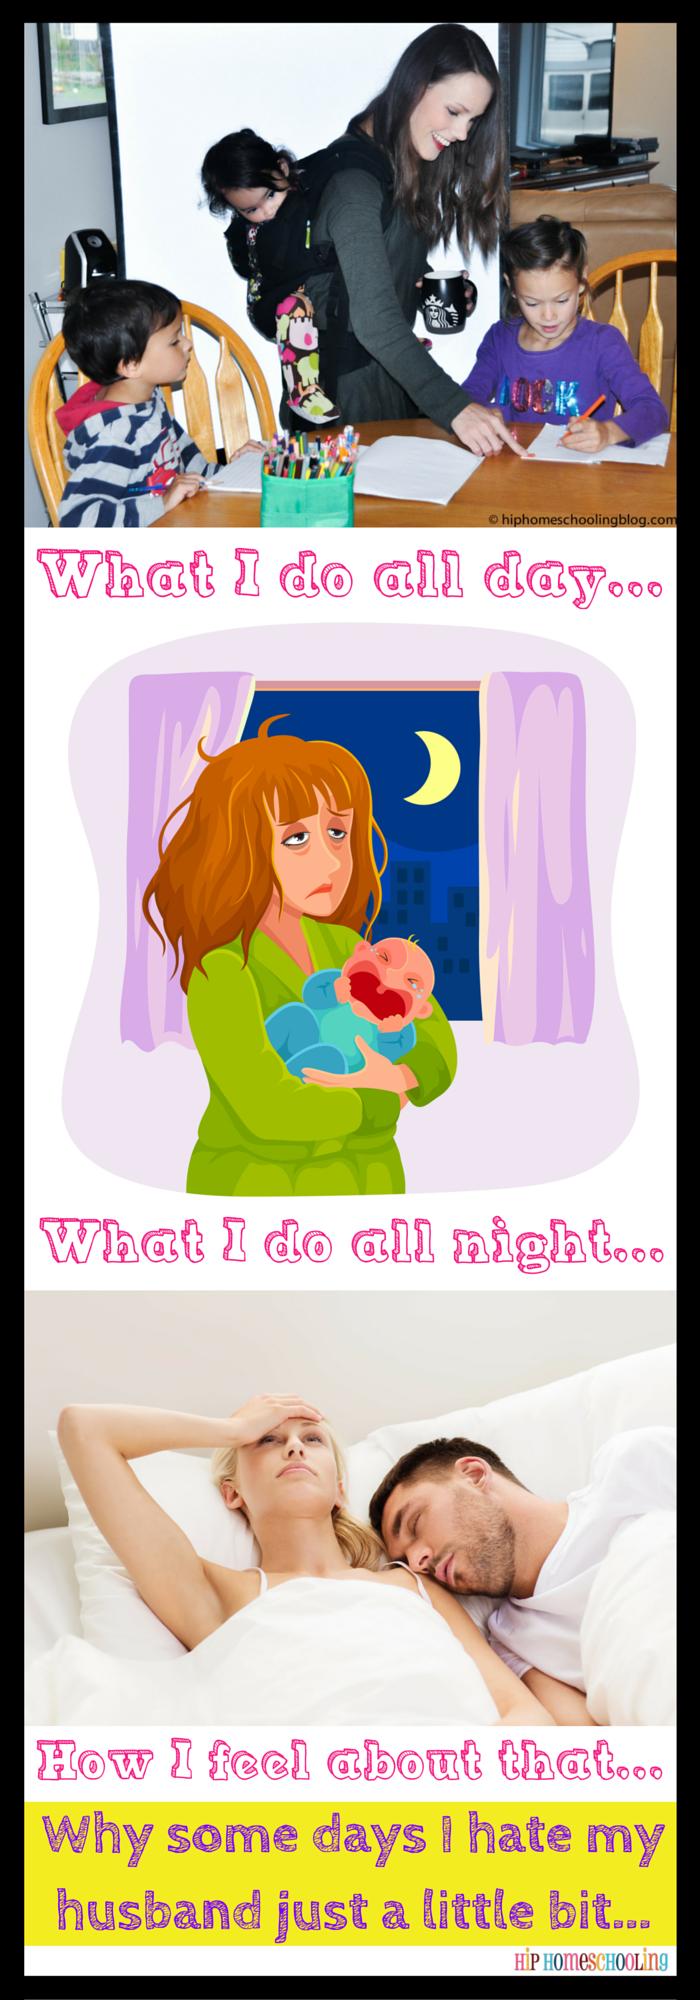 Husband Envy: Why some days I hate my husband a little bit.